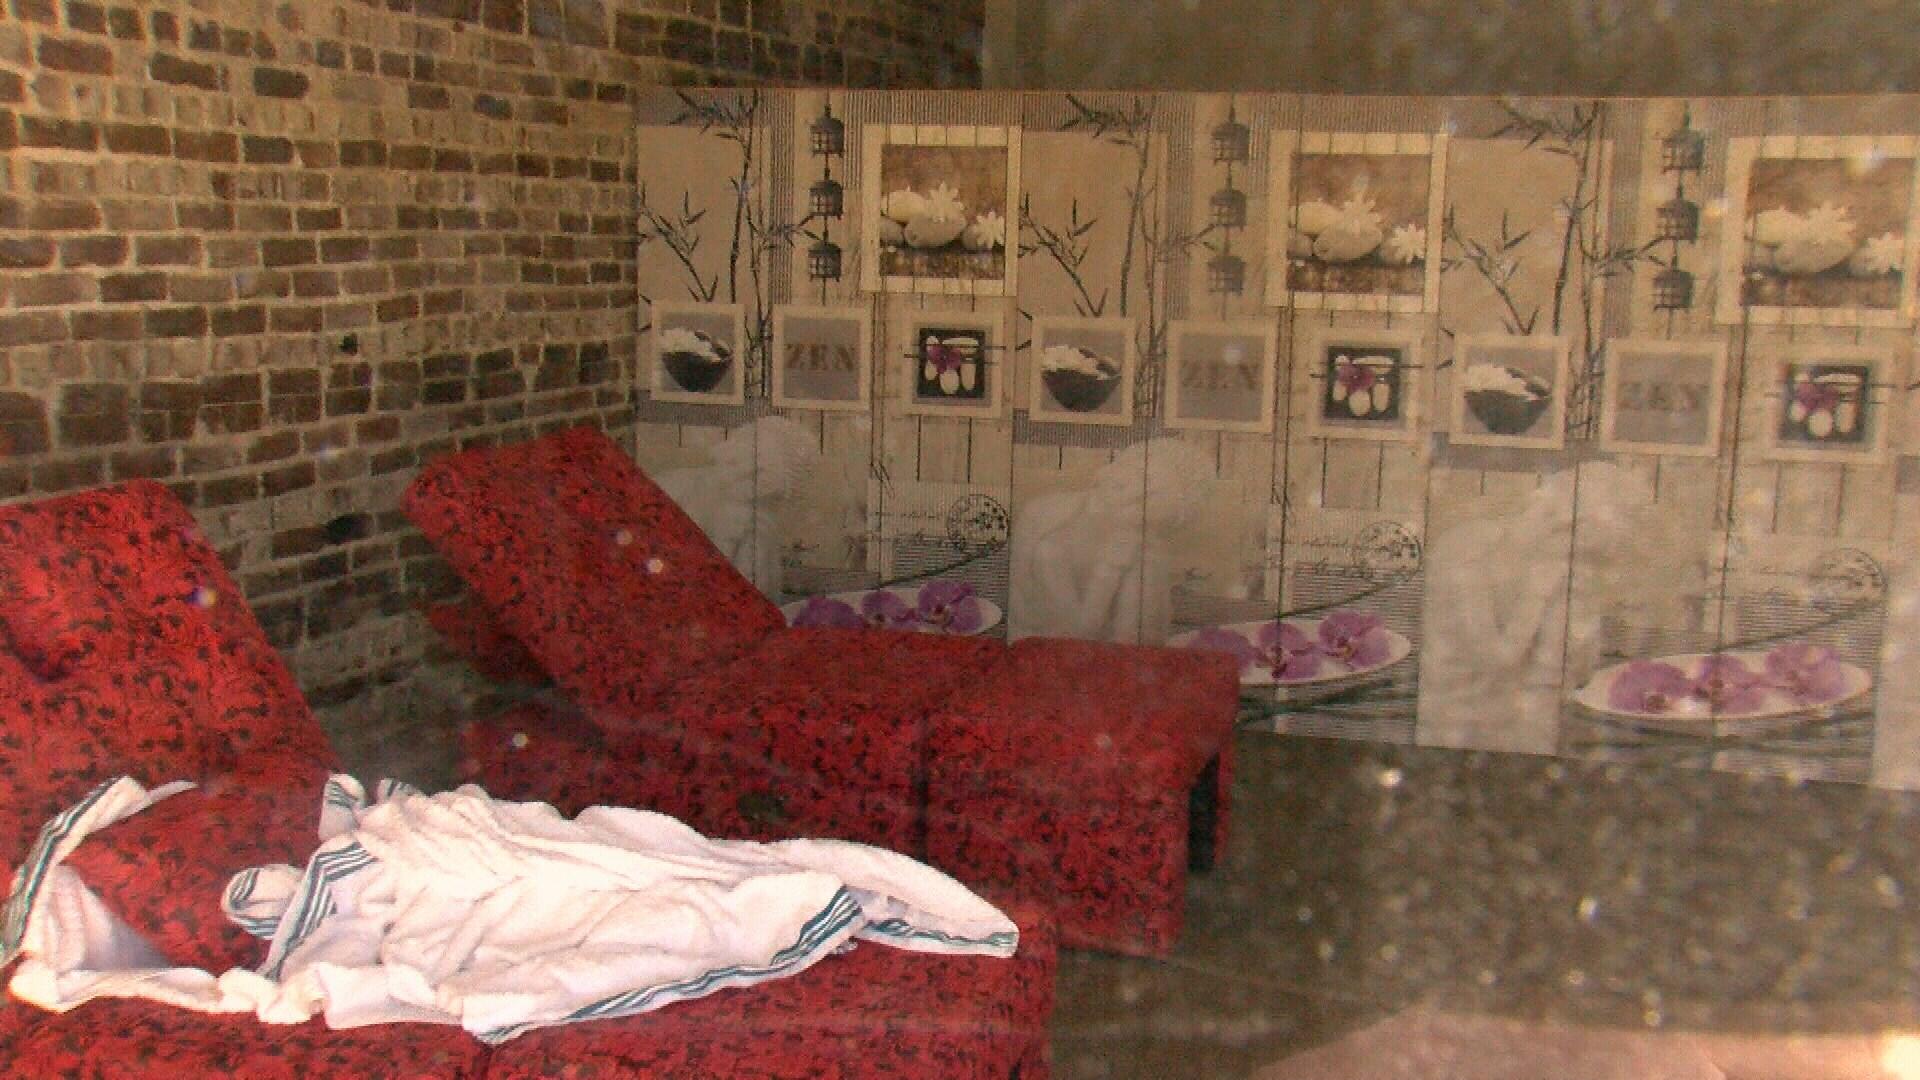 Looking through window of Royal Massage